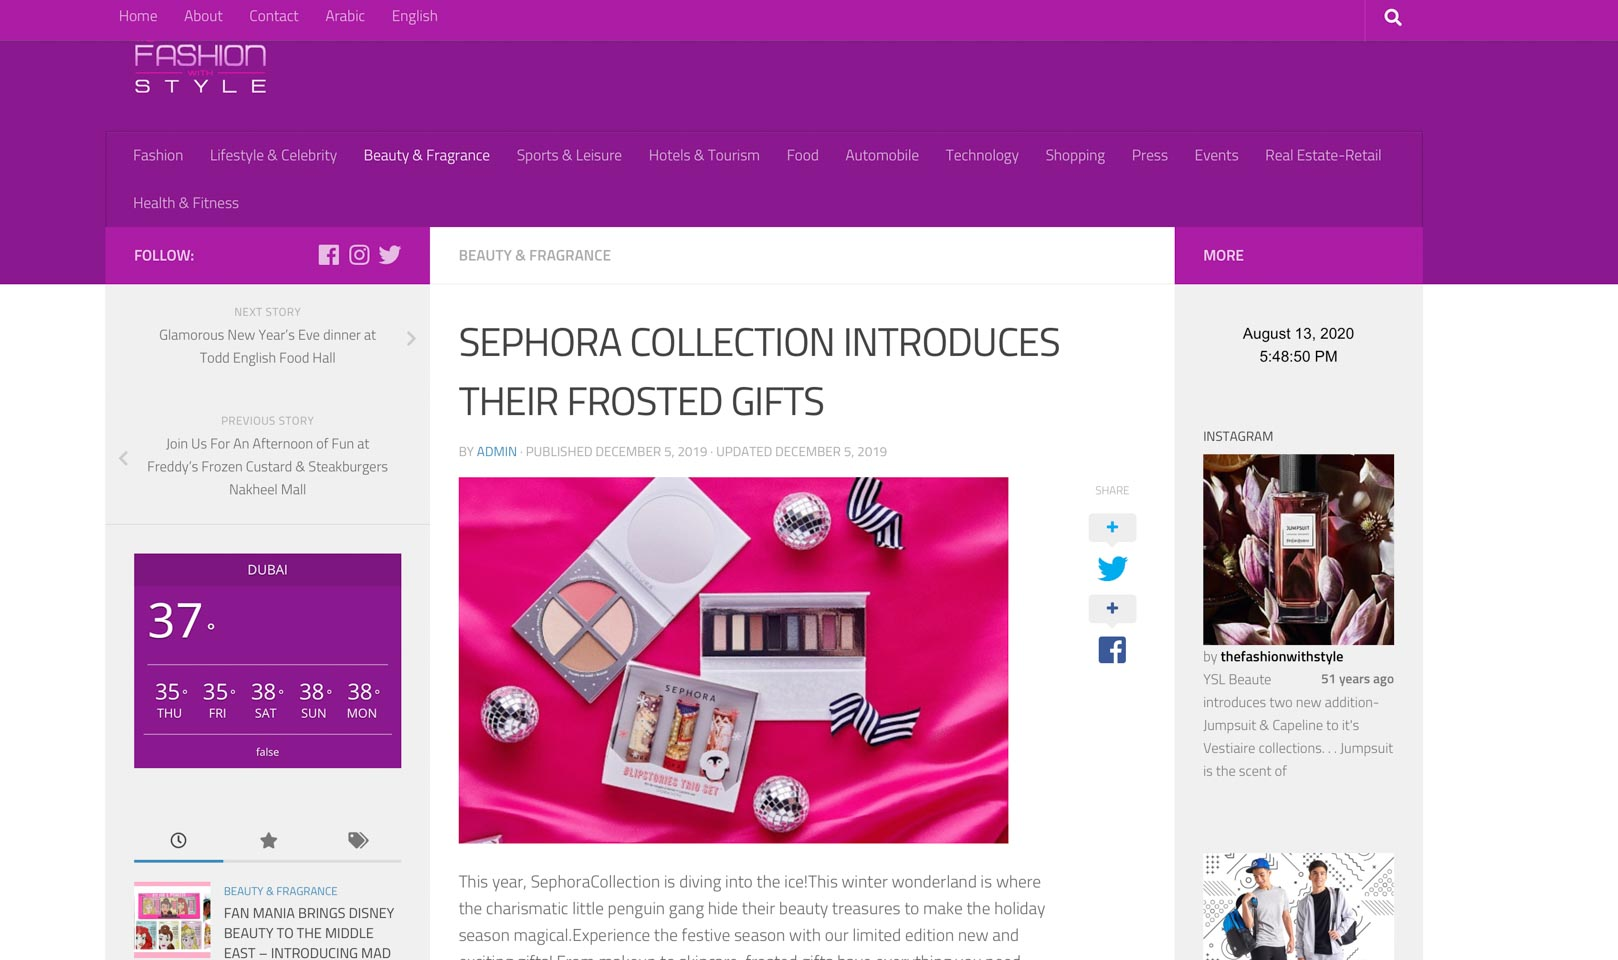 Sephora - Festive Season promotion Publicty